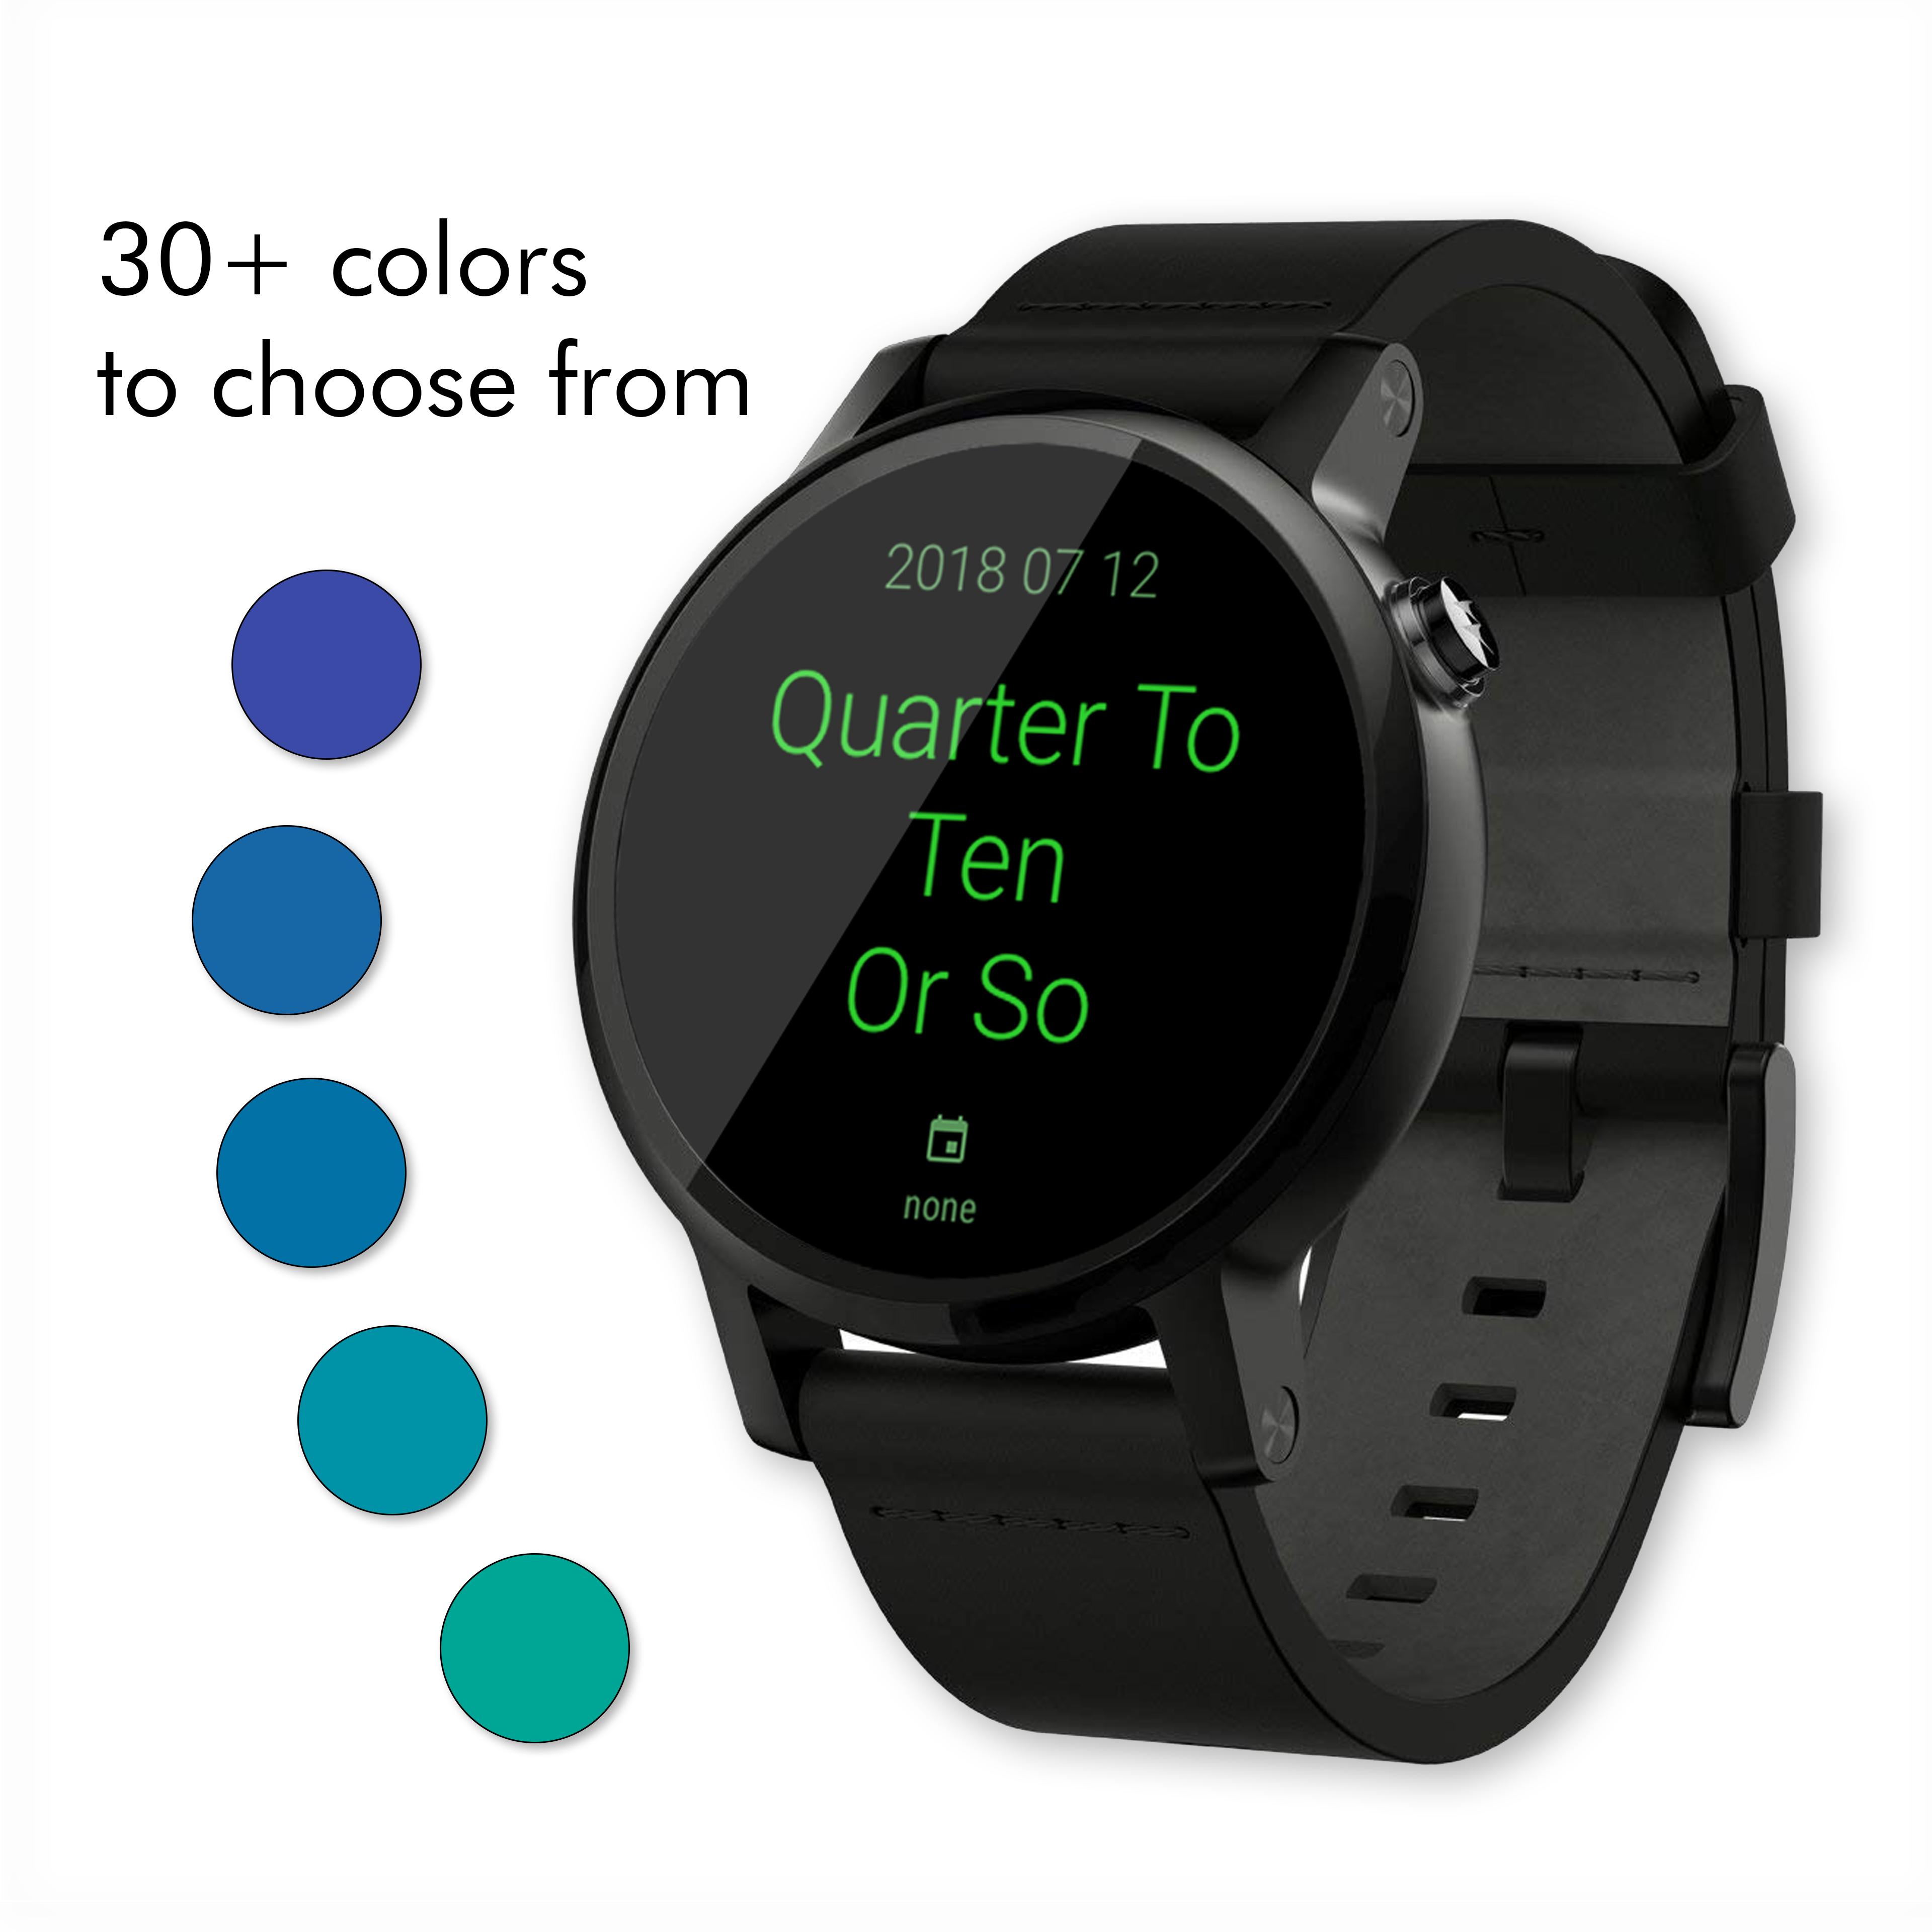 Twelveish Watch Face for Wear OS (Android Wear) - Screenshot2